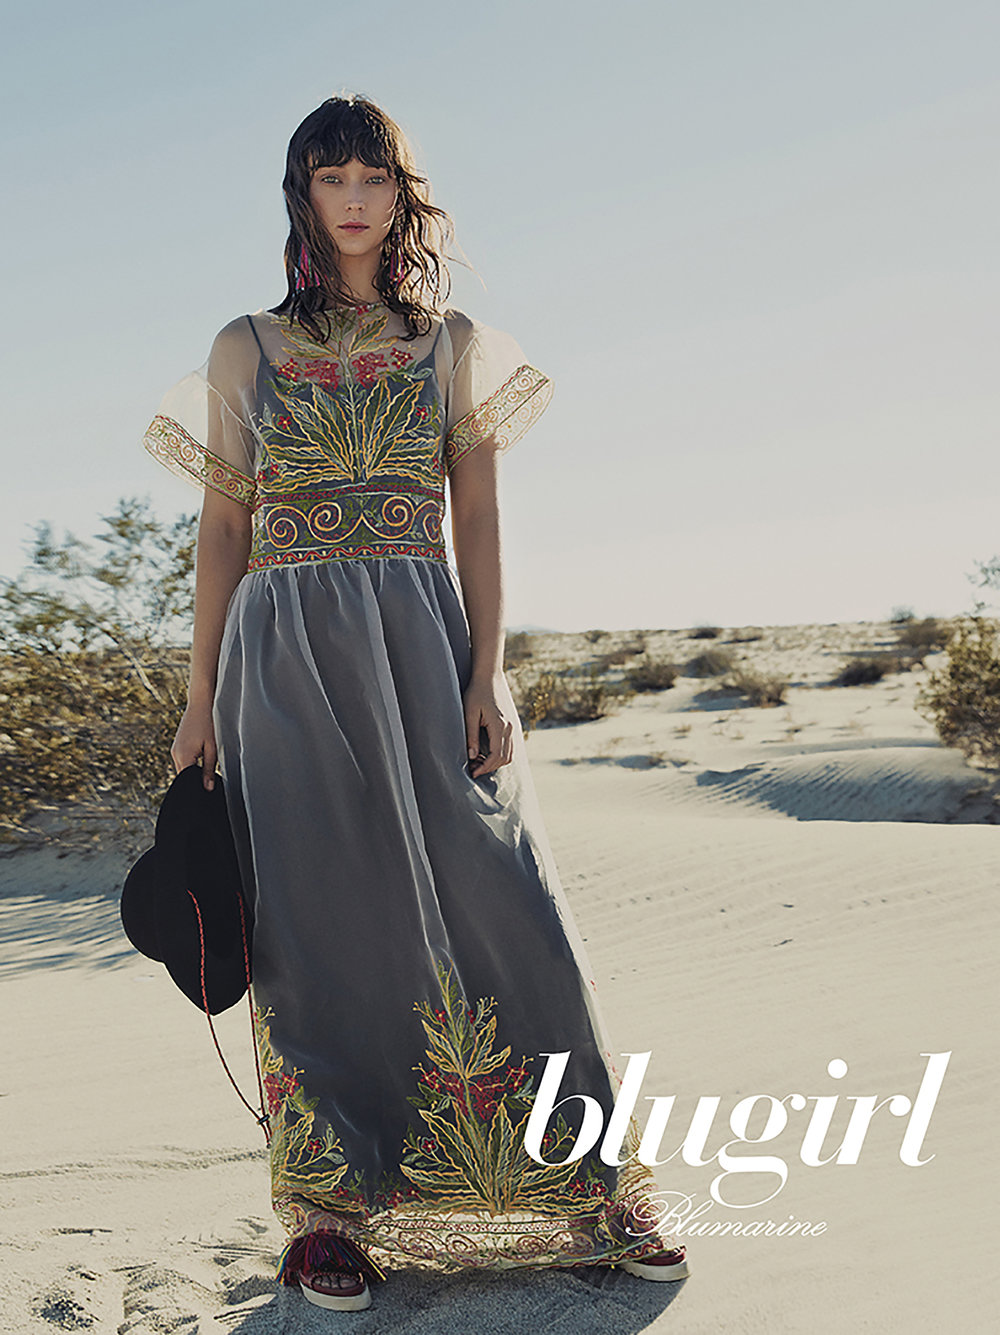 17SS-Blugirl-Campaign-LTE-035.jpg